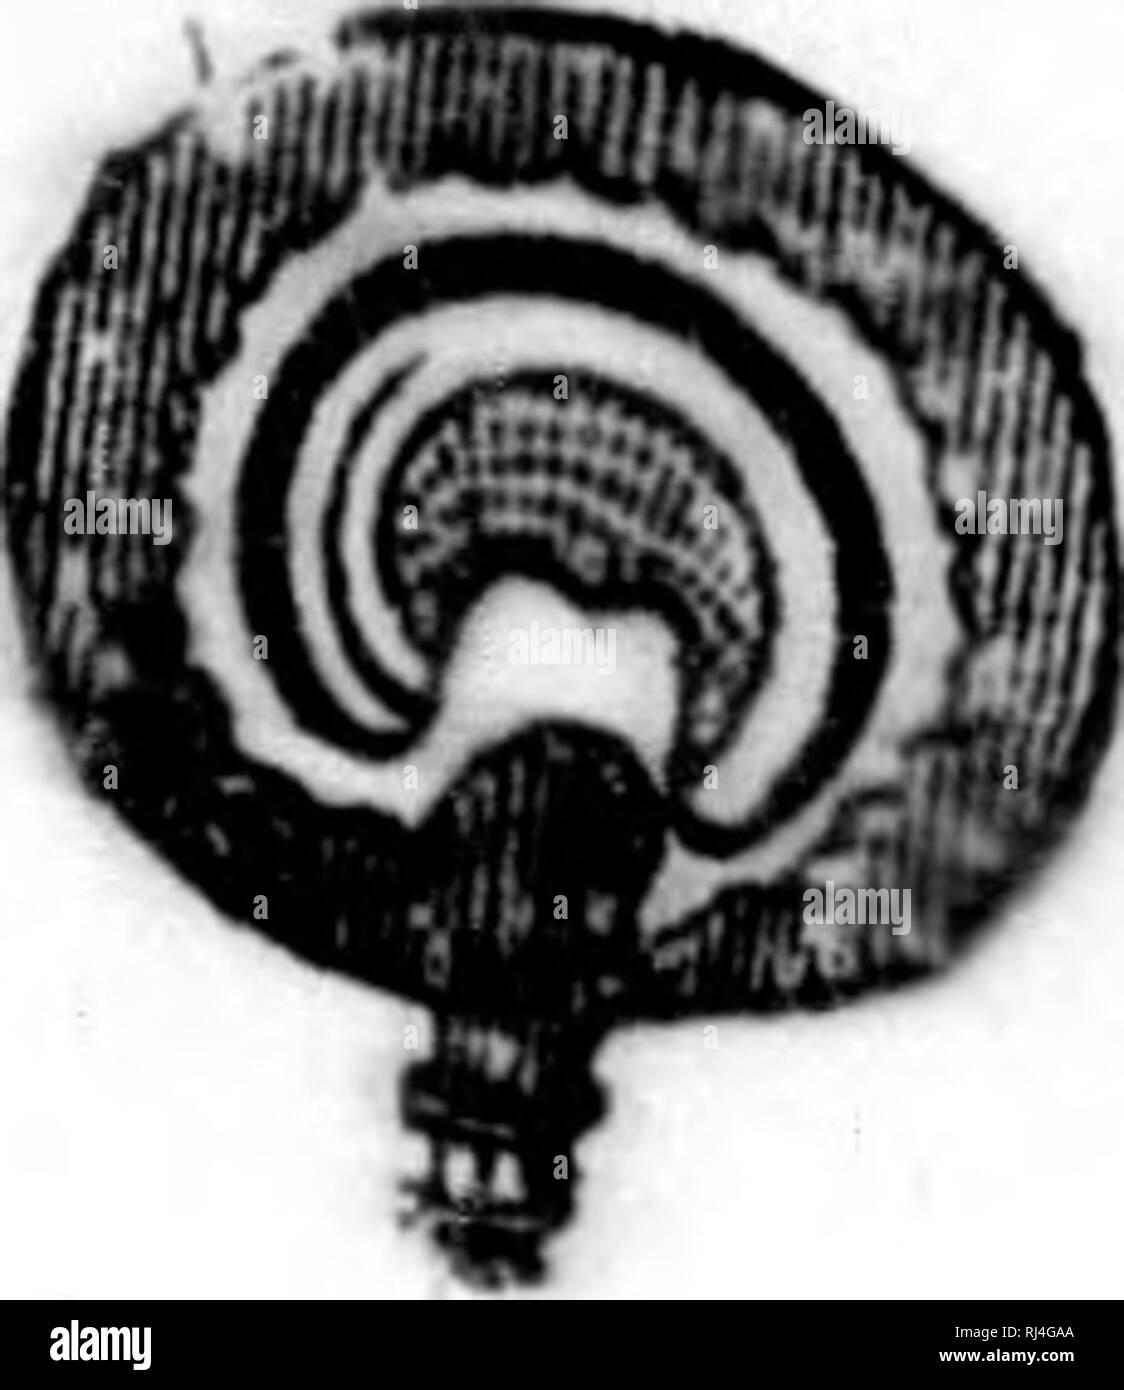 ". Cours élémentaire de botanique et flore du Canada à l'usage des maisons d'éducation [microforme]. Botanique; Plantes; Botany; Plants. 183. ^ ,9 I «7 US. Fleur pislillée. 184. Kruit. 185. Deux fruita coupas transTersa"" lement lesecond jusqu'il «ado- oarpe exclusivement. 180. Fruit uuupé longitudinaUment. Wl. (iraine. 188,. Smbryon courbe. - imiMi»ijiciiiiii>Jinn it><?nii .H''u>i-»J»!ii6»aiMMiiig»eiaew Ler'''(''.'i.it]iMonlre«l.. Please note that these images are extracted from scanned page images that may have been digitally enhanced for readability - coloration and appearanc - Stock Image"